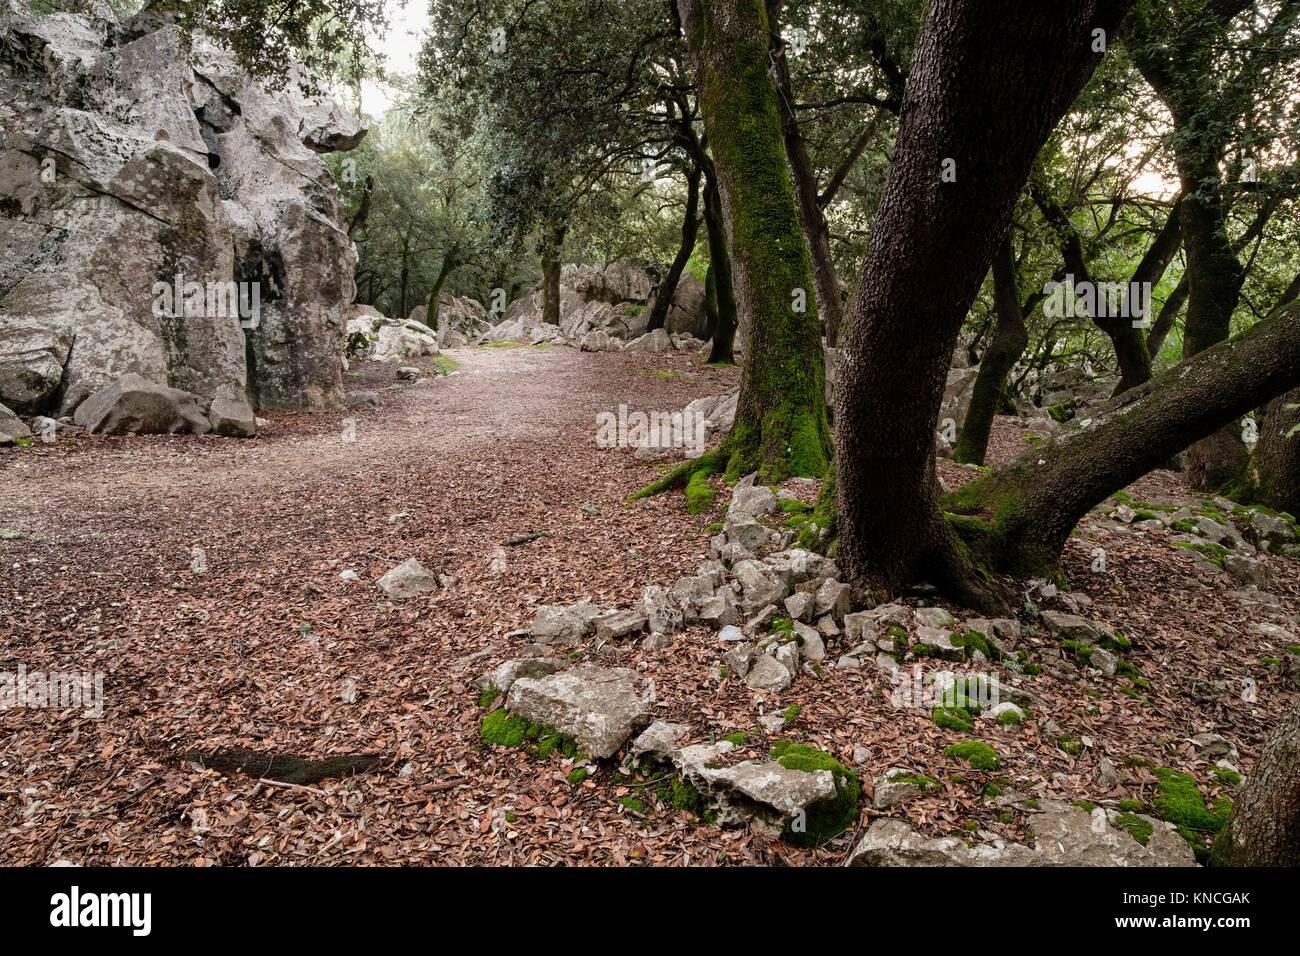 Forest of oaks and karst rock, Es Pixarells, escorca, natural site of the Sierra de Tramuntana, Mallorca, Balearic Stock Photo